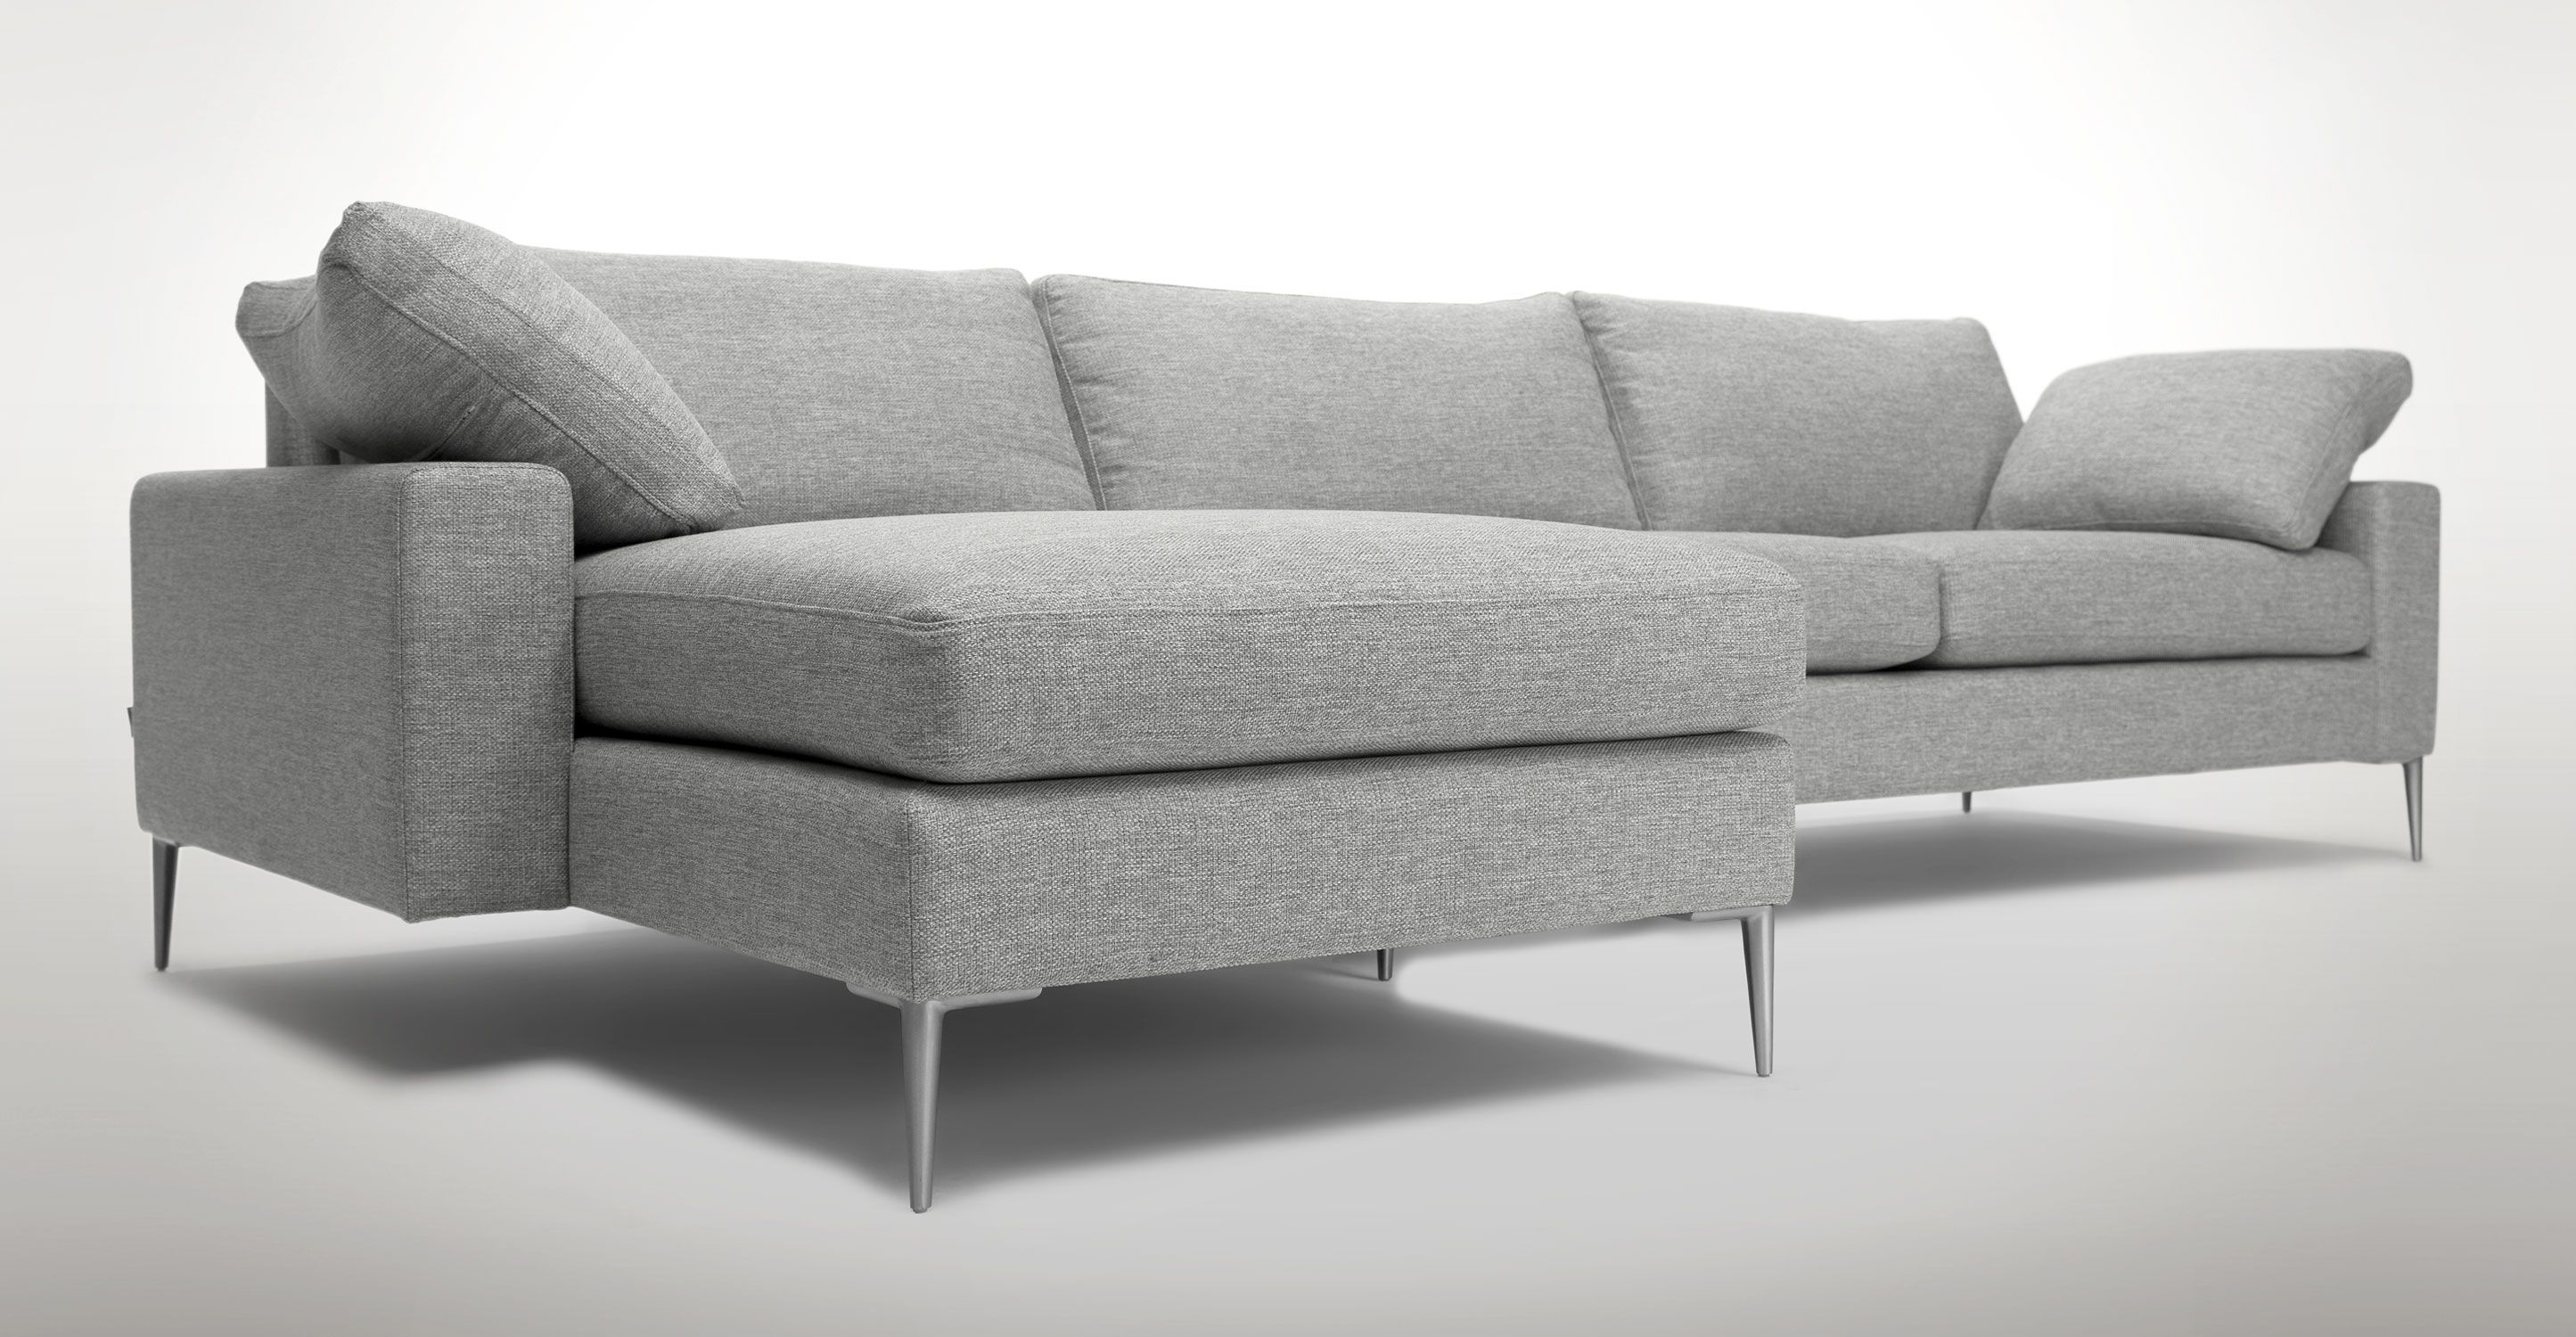 Light Gray Left Sectional Sofa Metal Legs Article Nova Bedroom